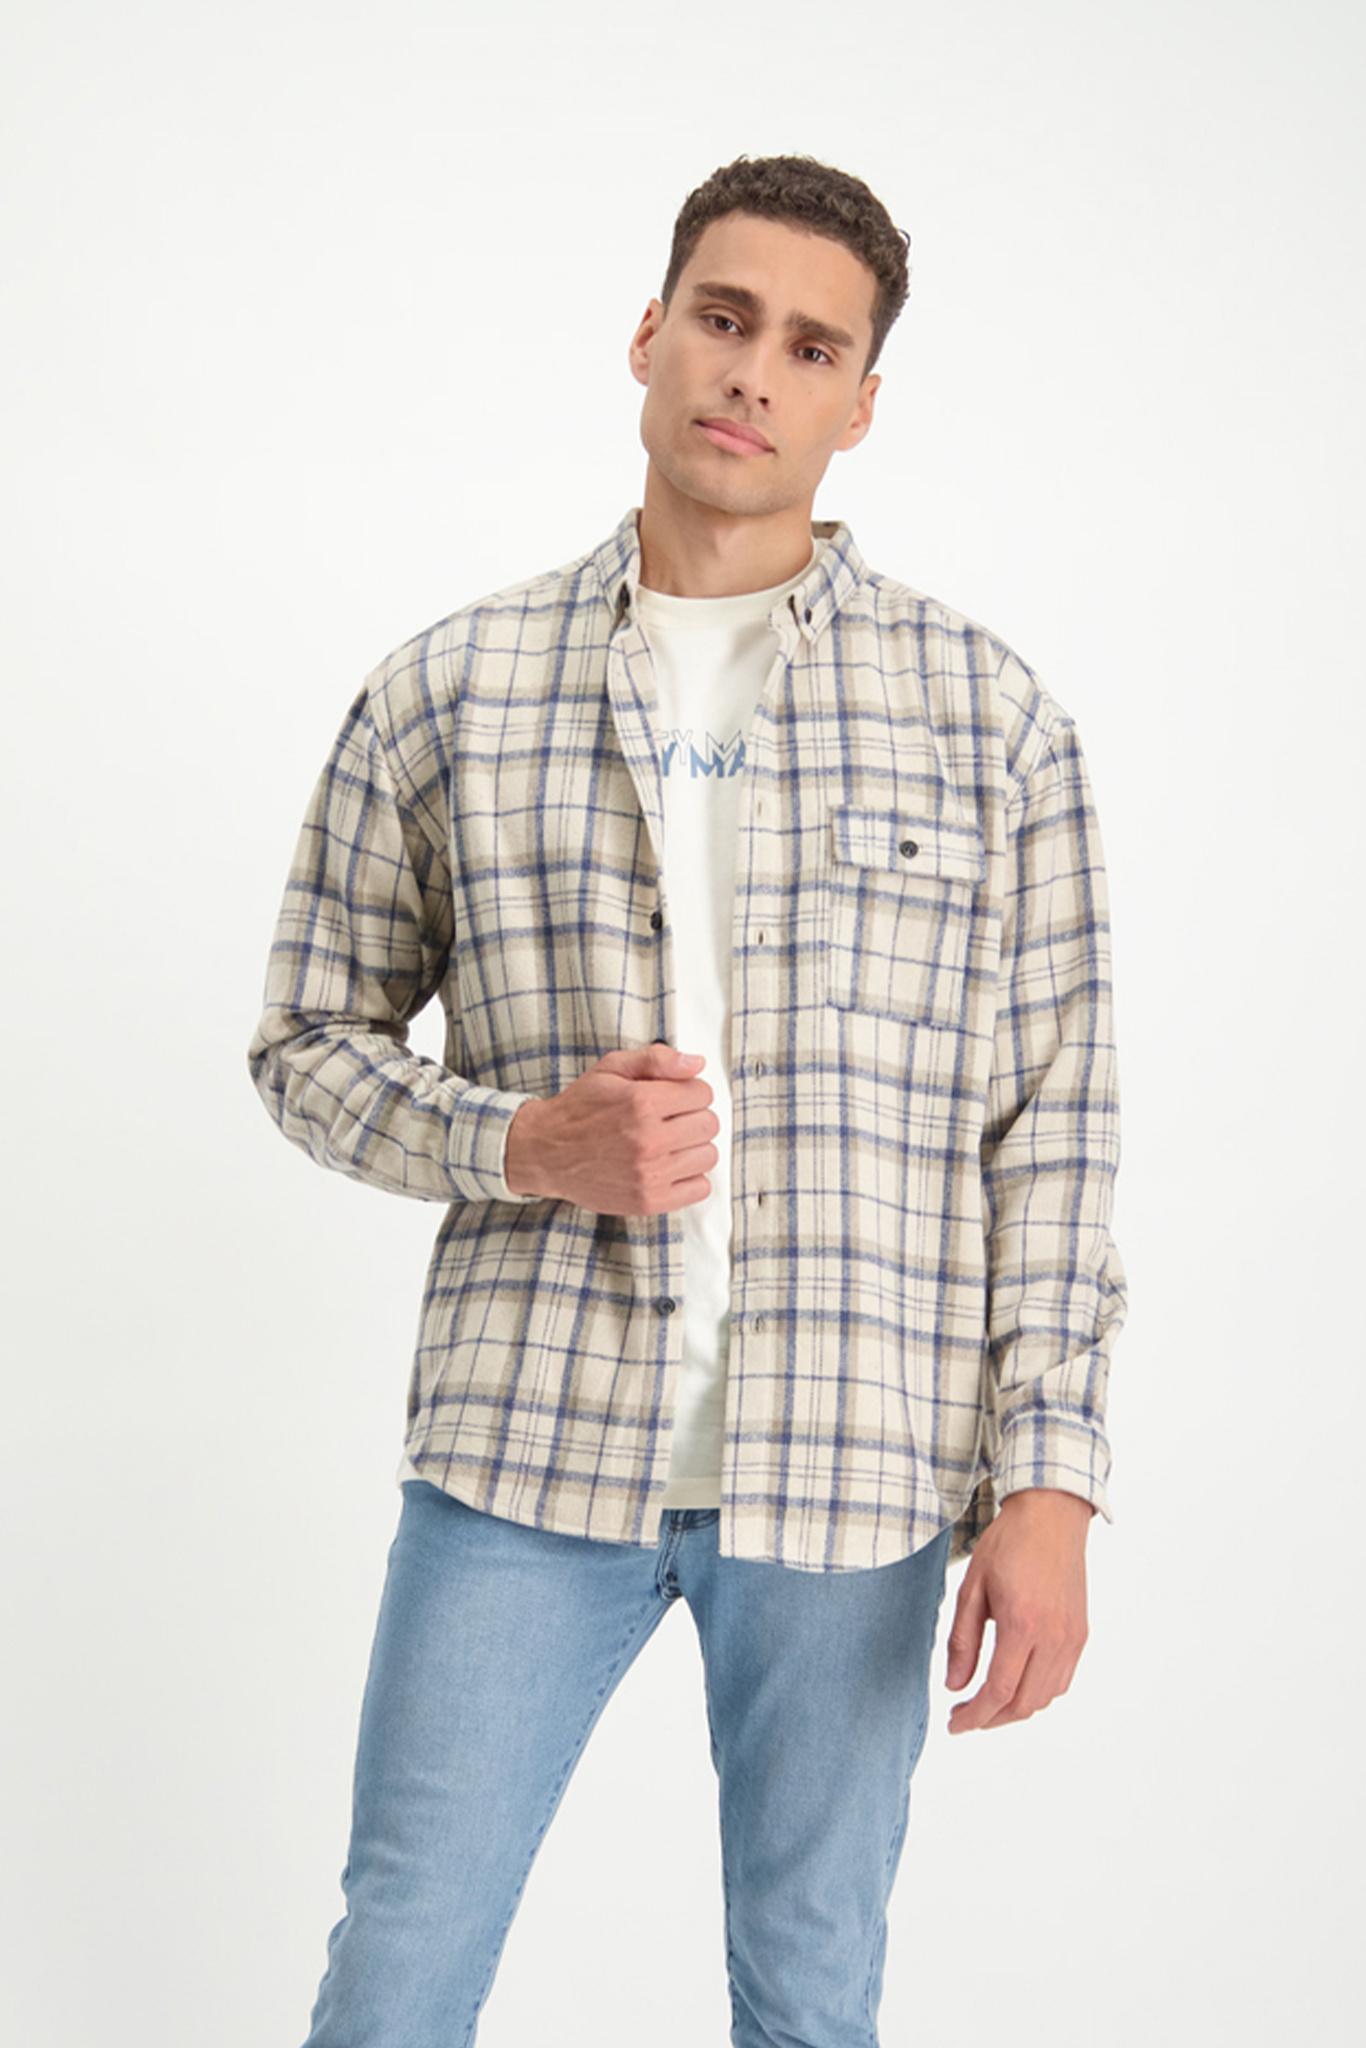 Lofty Manner Blue and white shirt Fransisco